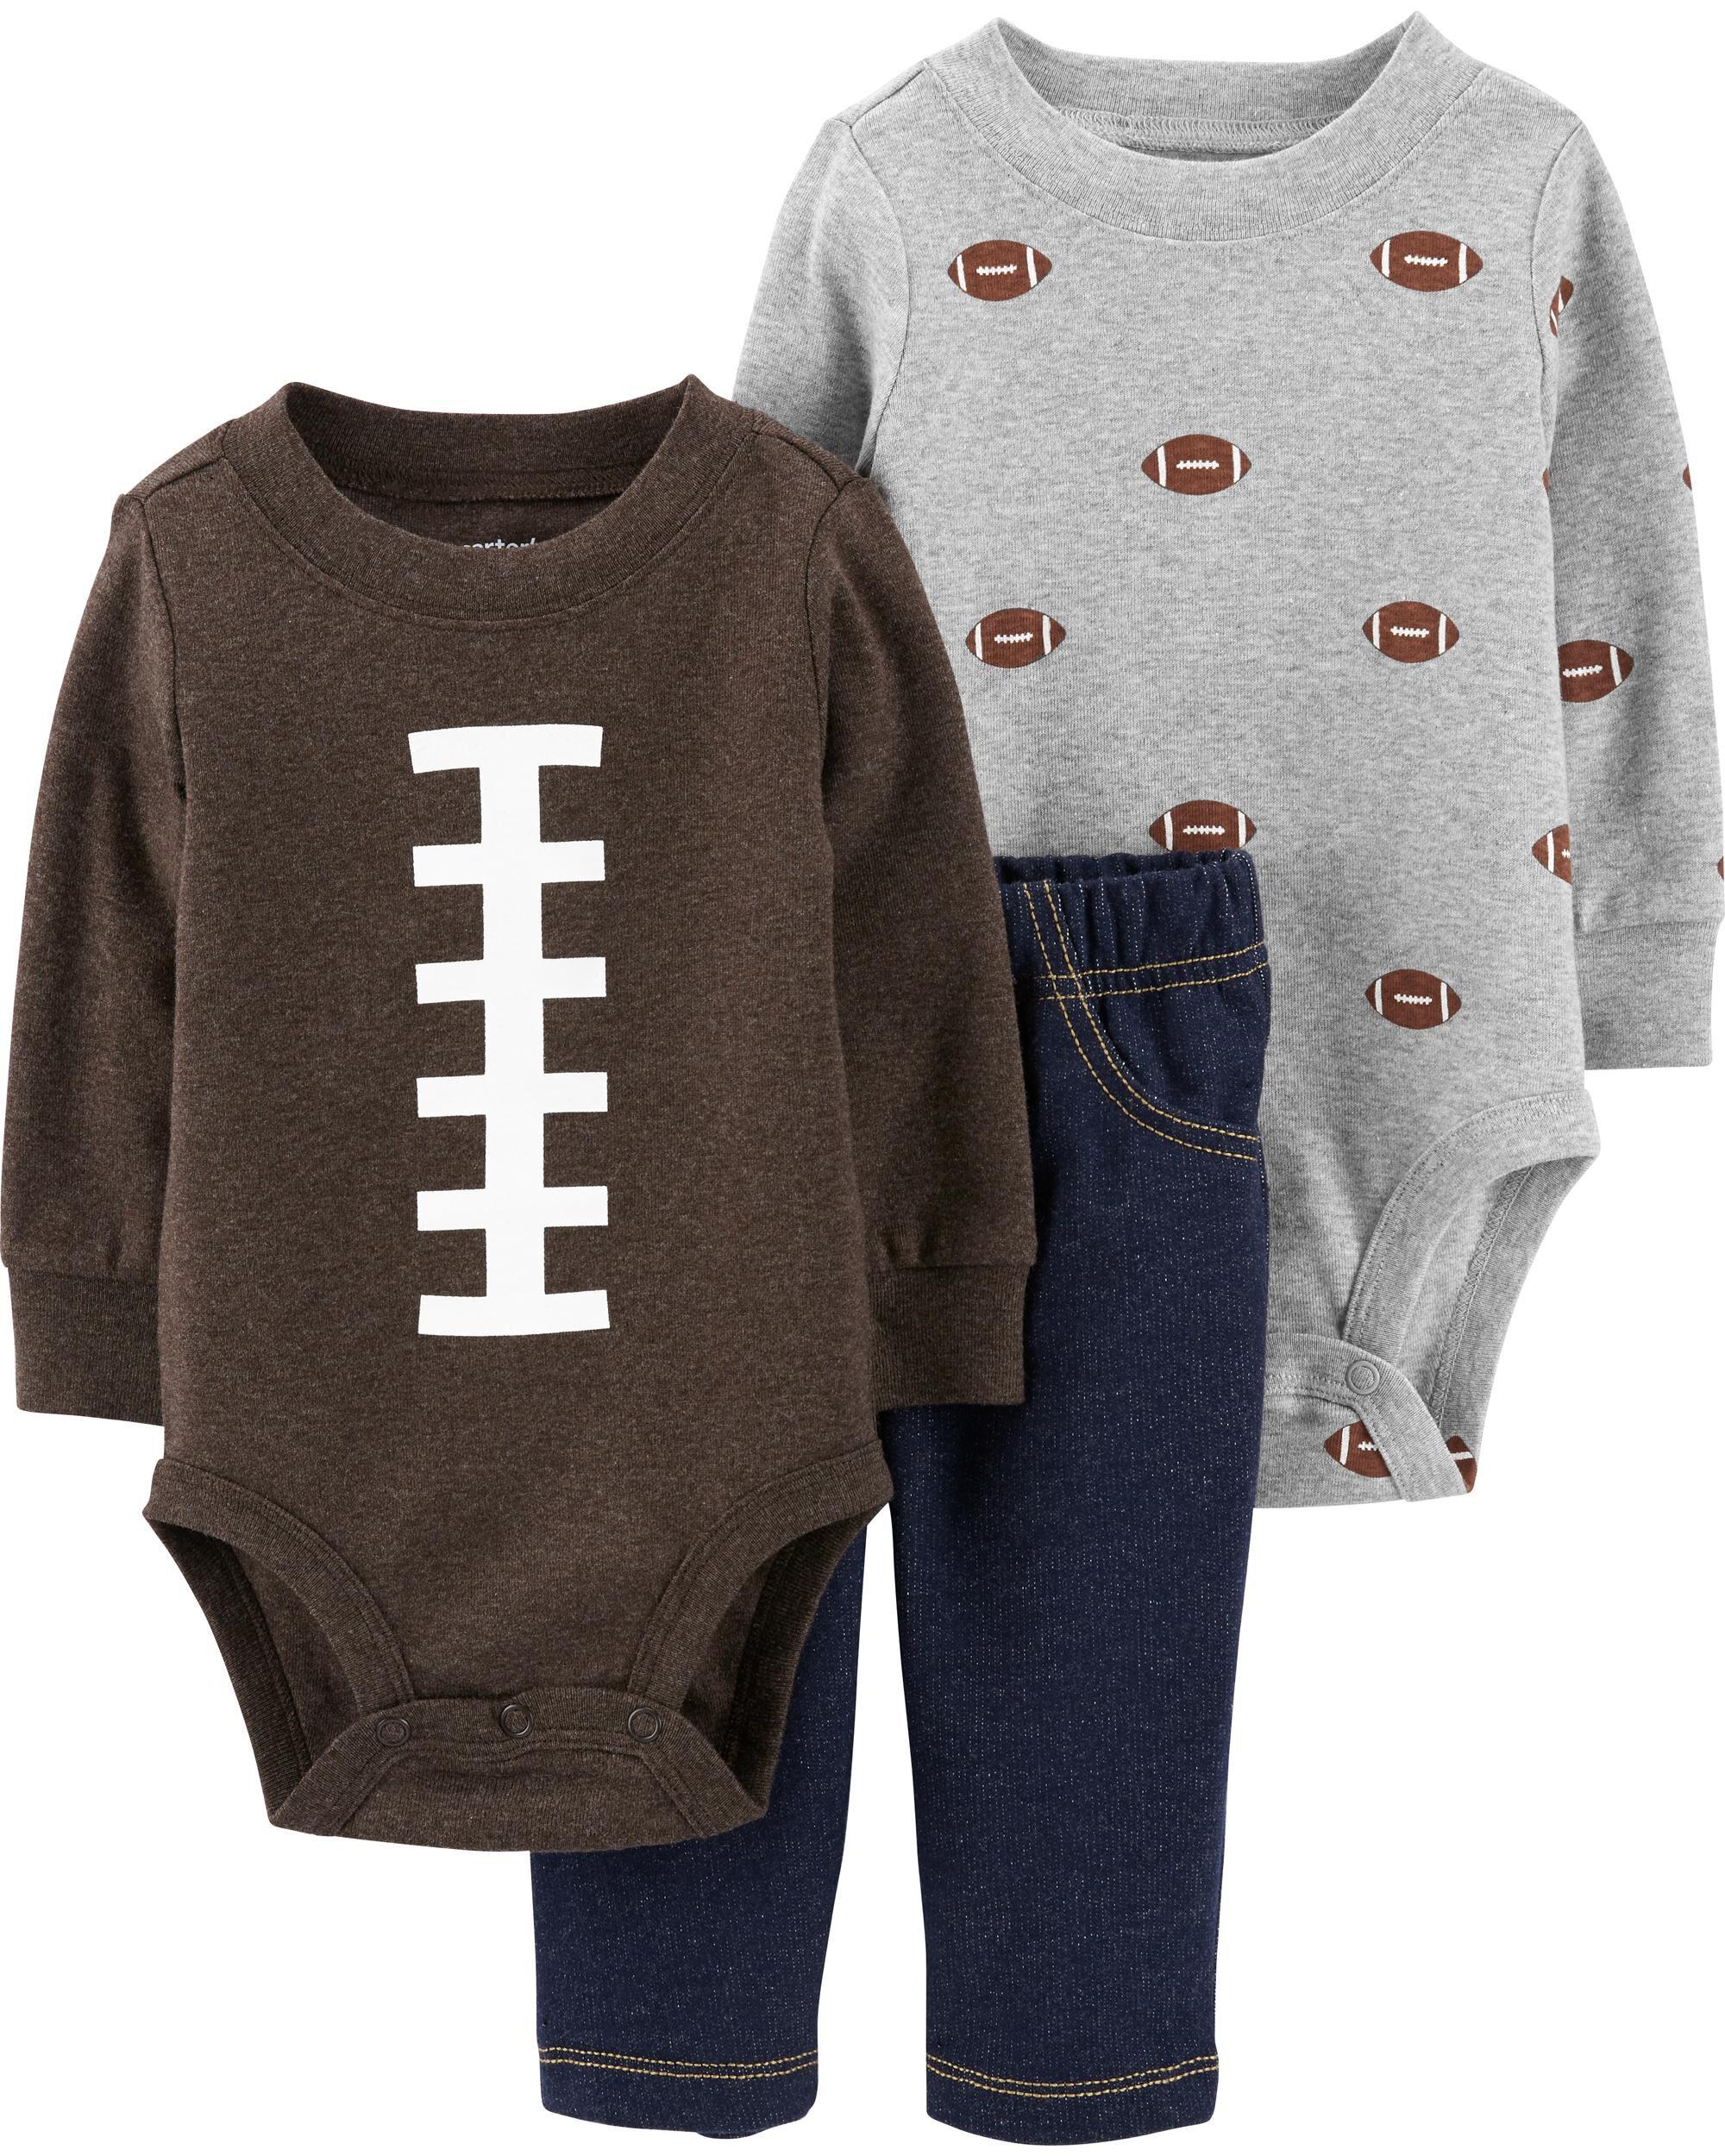 3-Piece Football Bodysuit & Knit Denim Pant Set